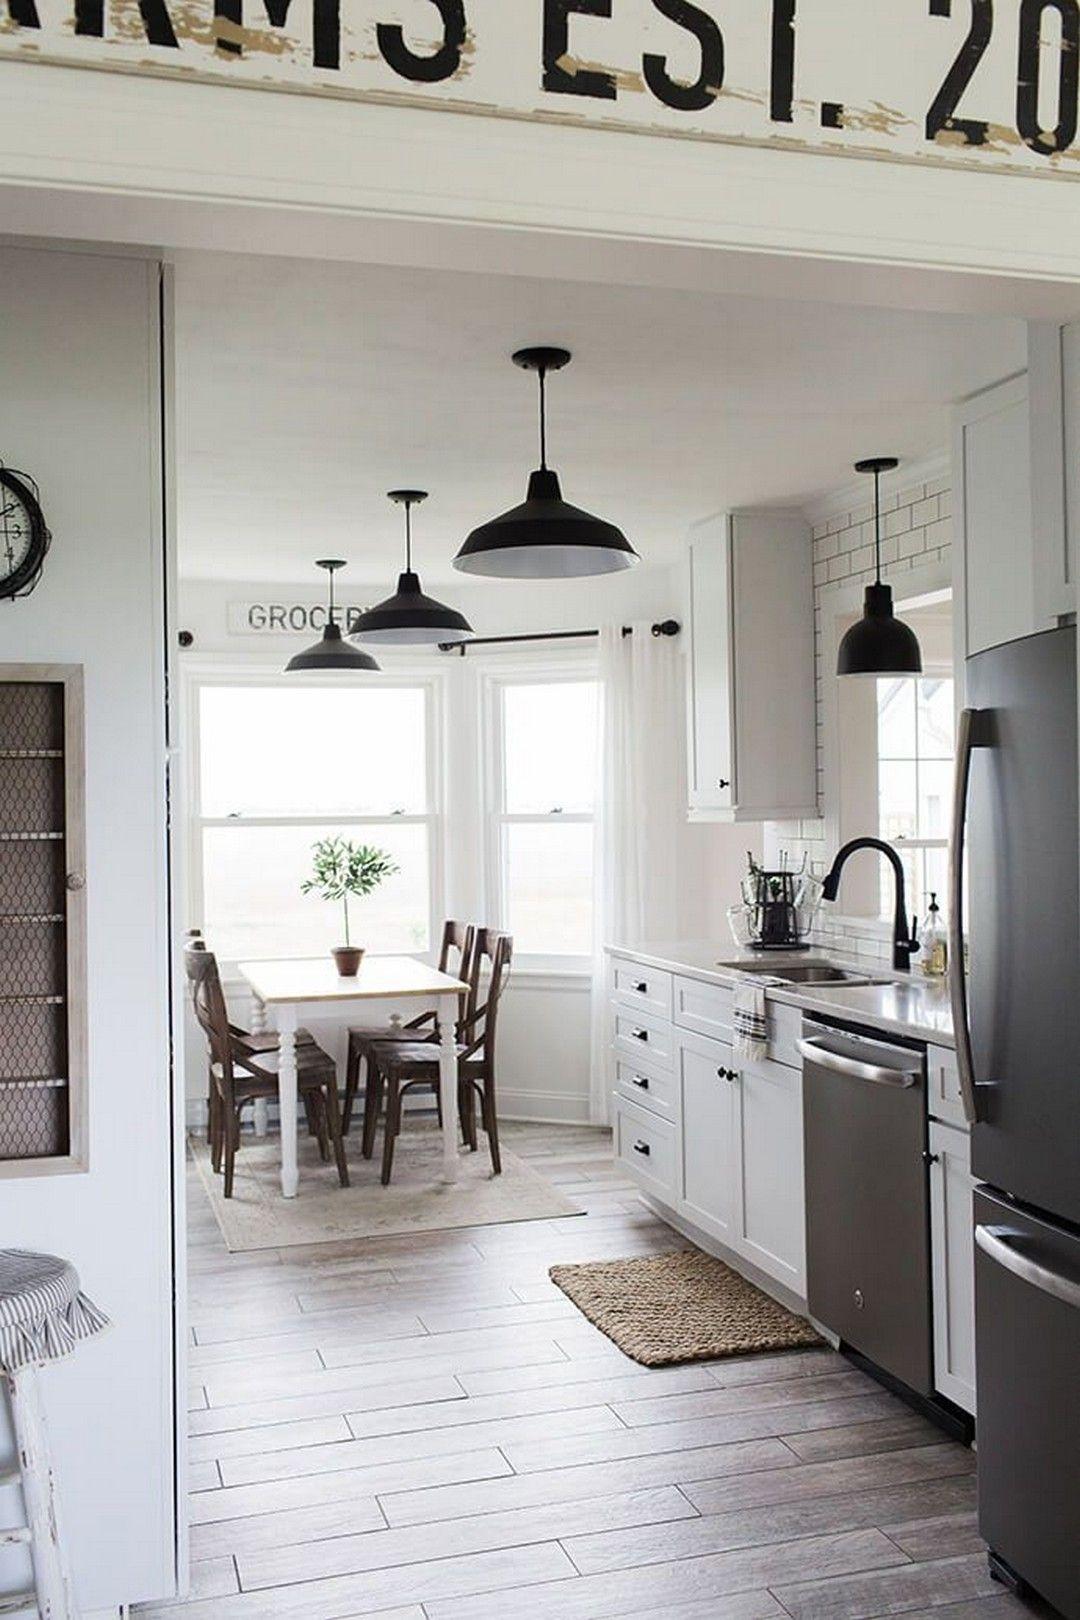 120 black and white home decor inspiration home decor kitchen modern farmhouse kitchens on farmhouse kitchen kitchen id=55330